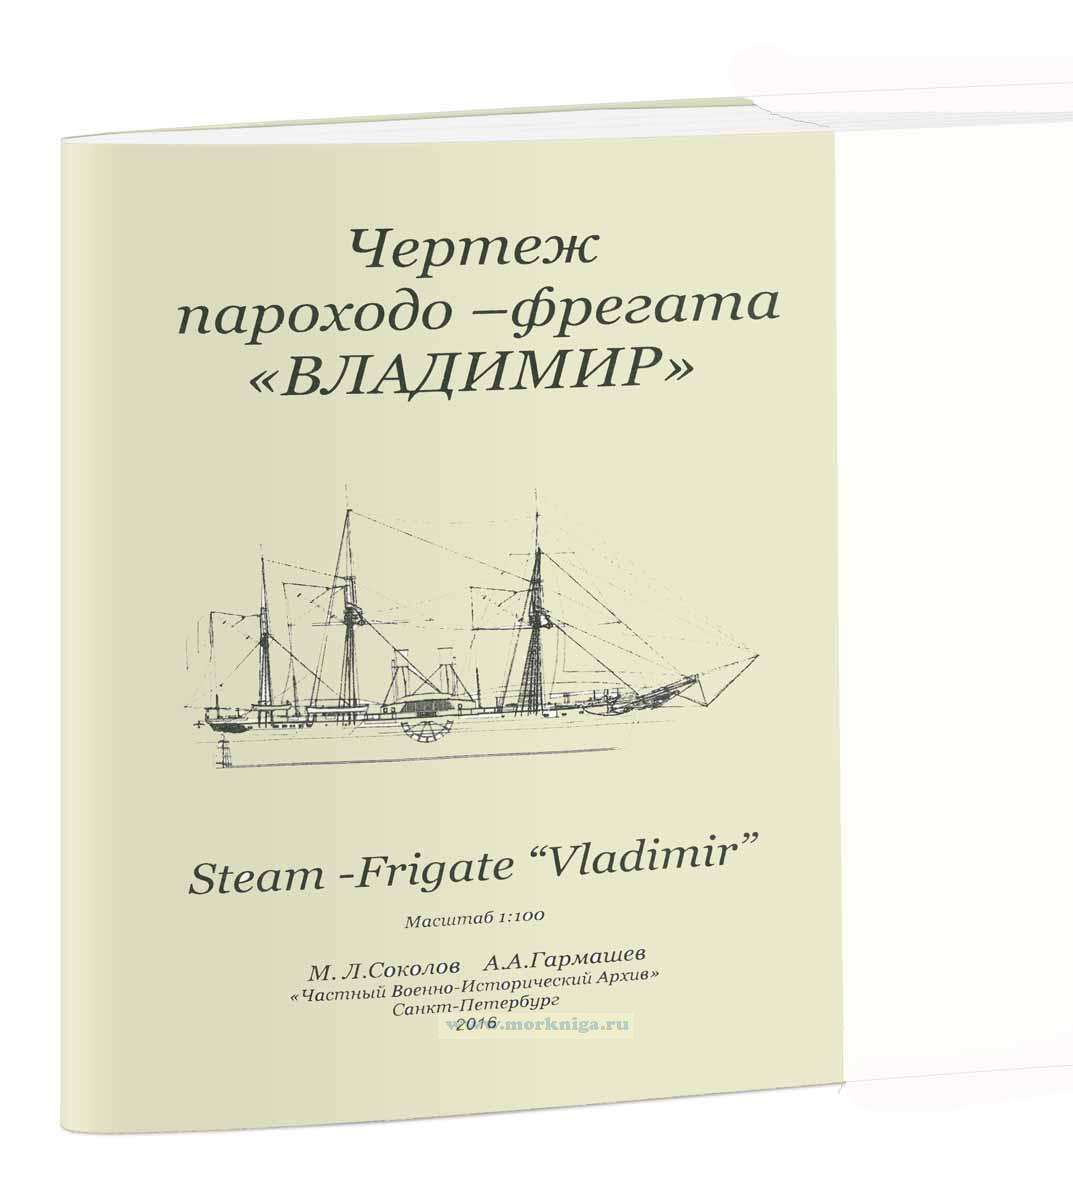 Чертежи кораблей Российского флота. Пароходо-фрегат